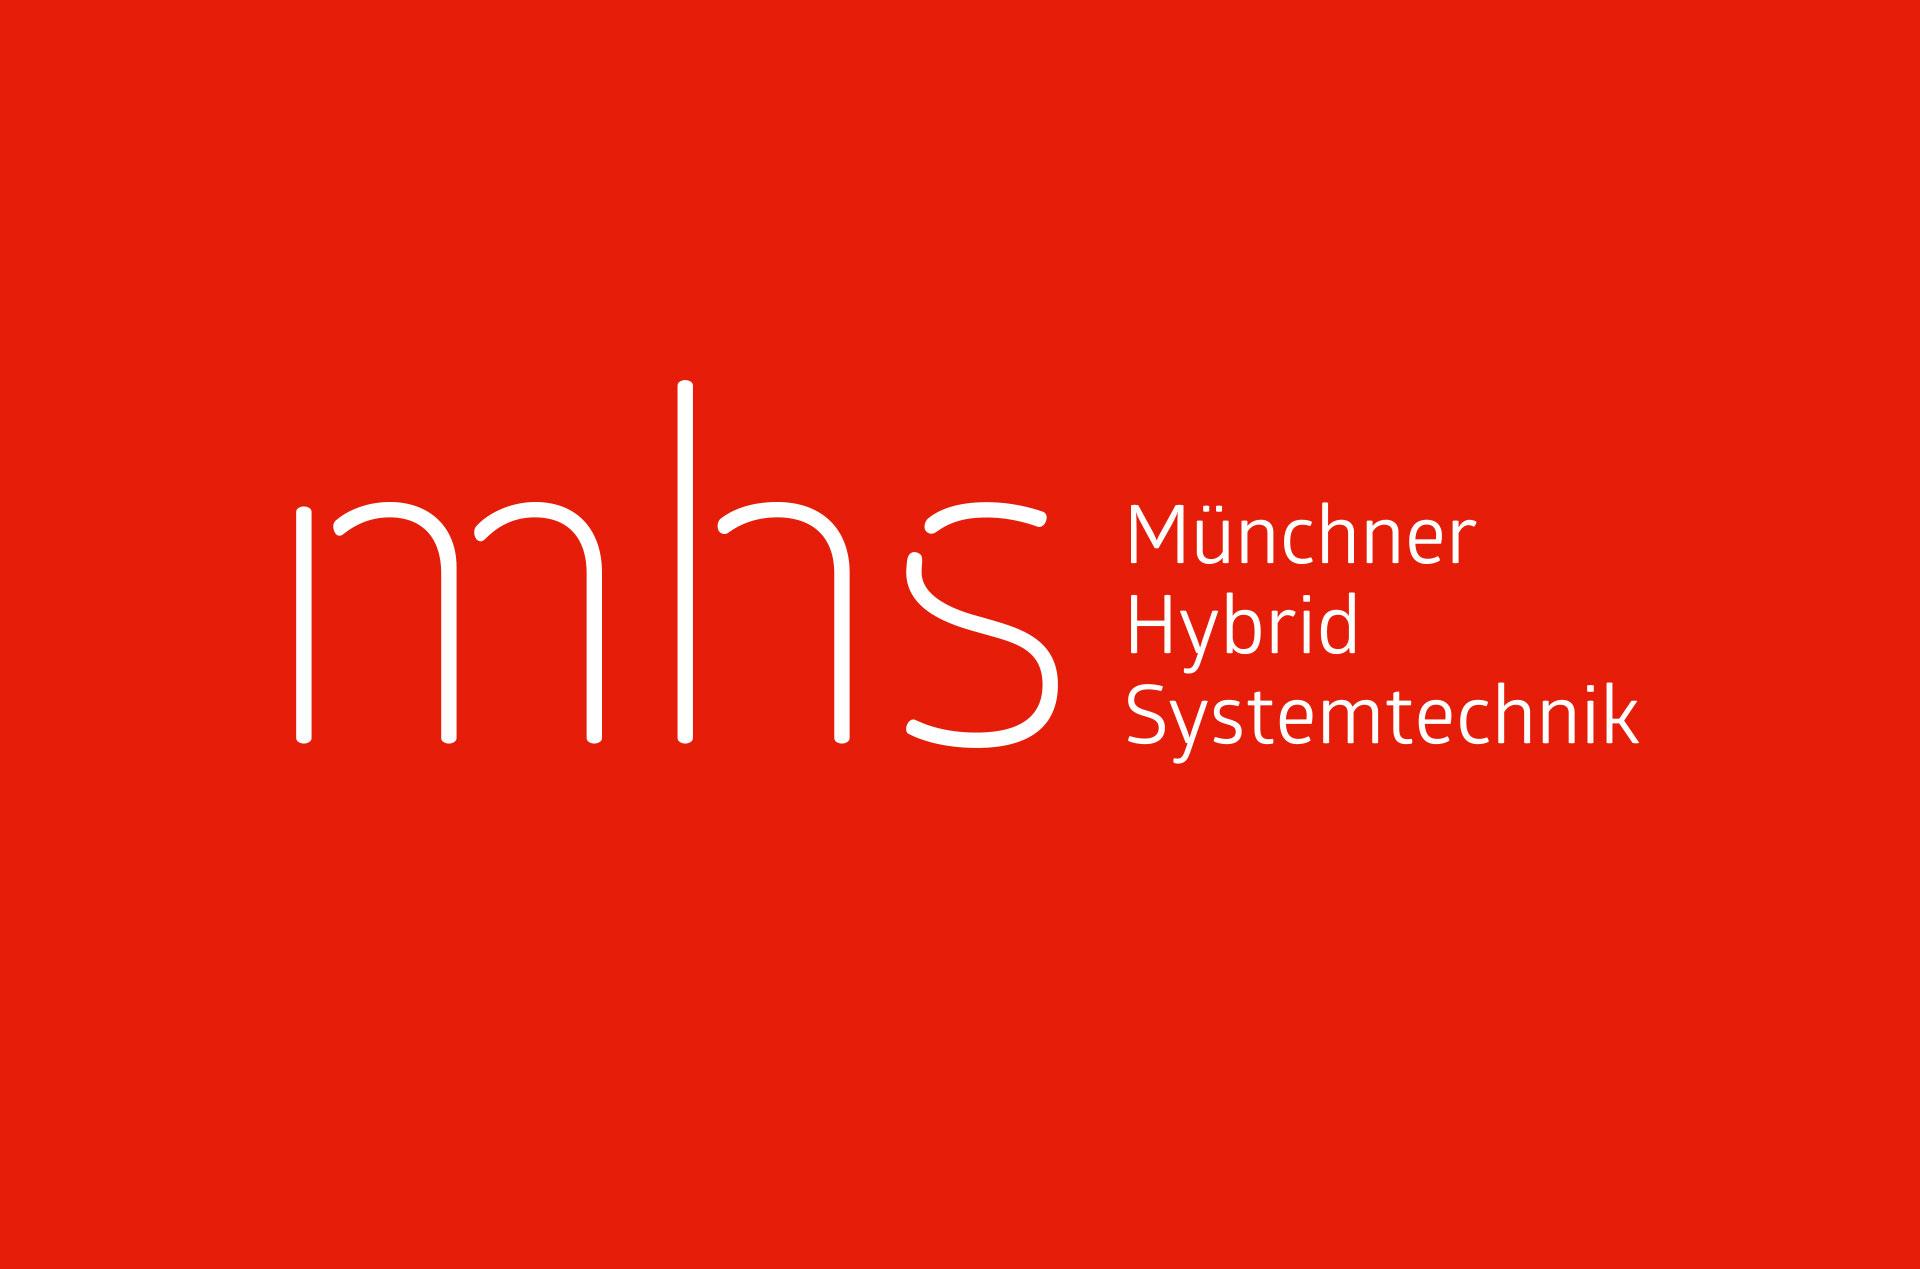 Münchner Hybrid Systemtechnik